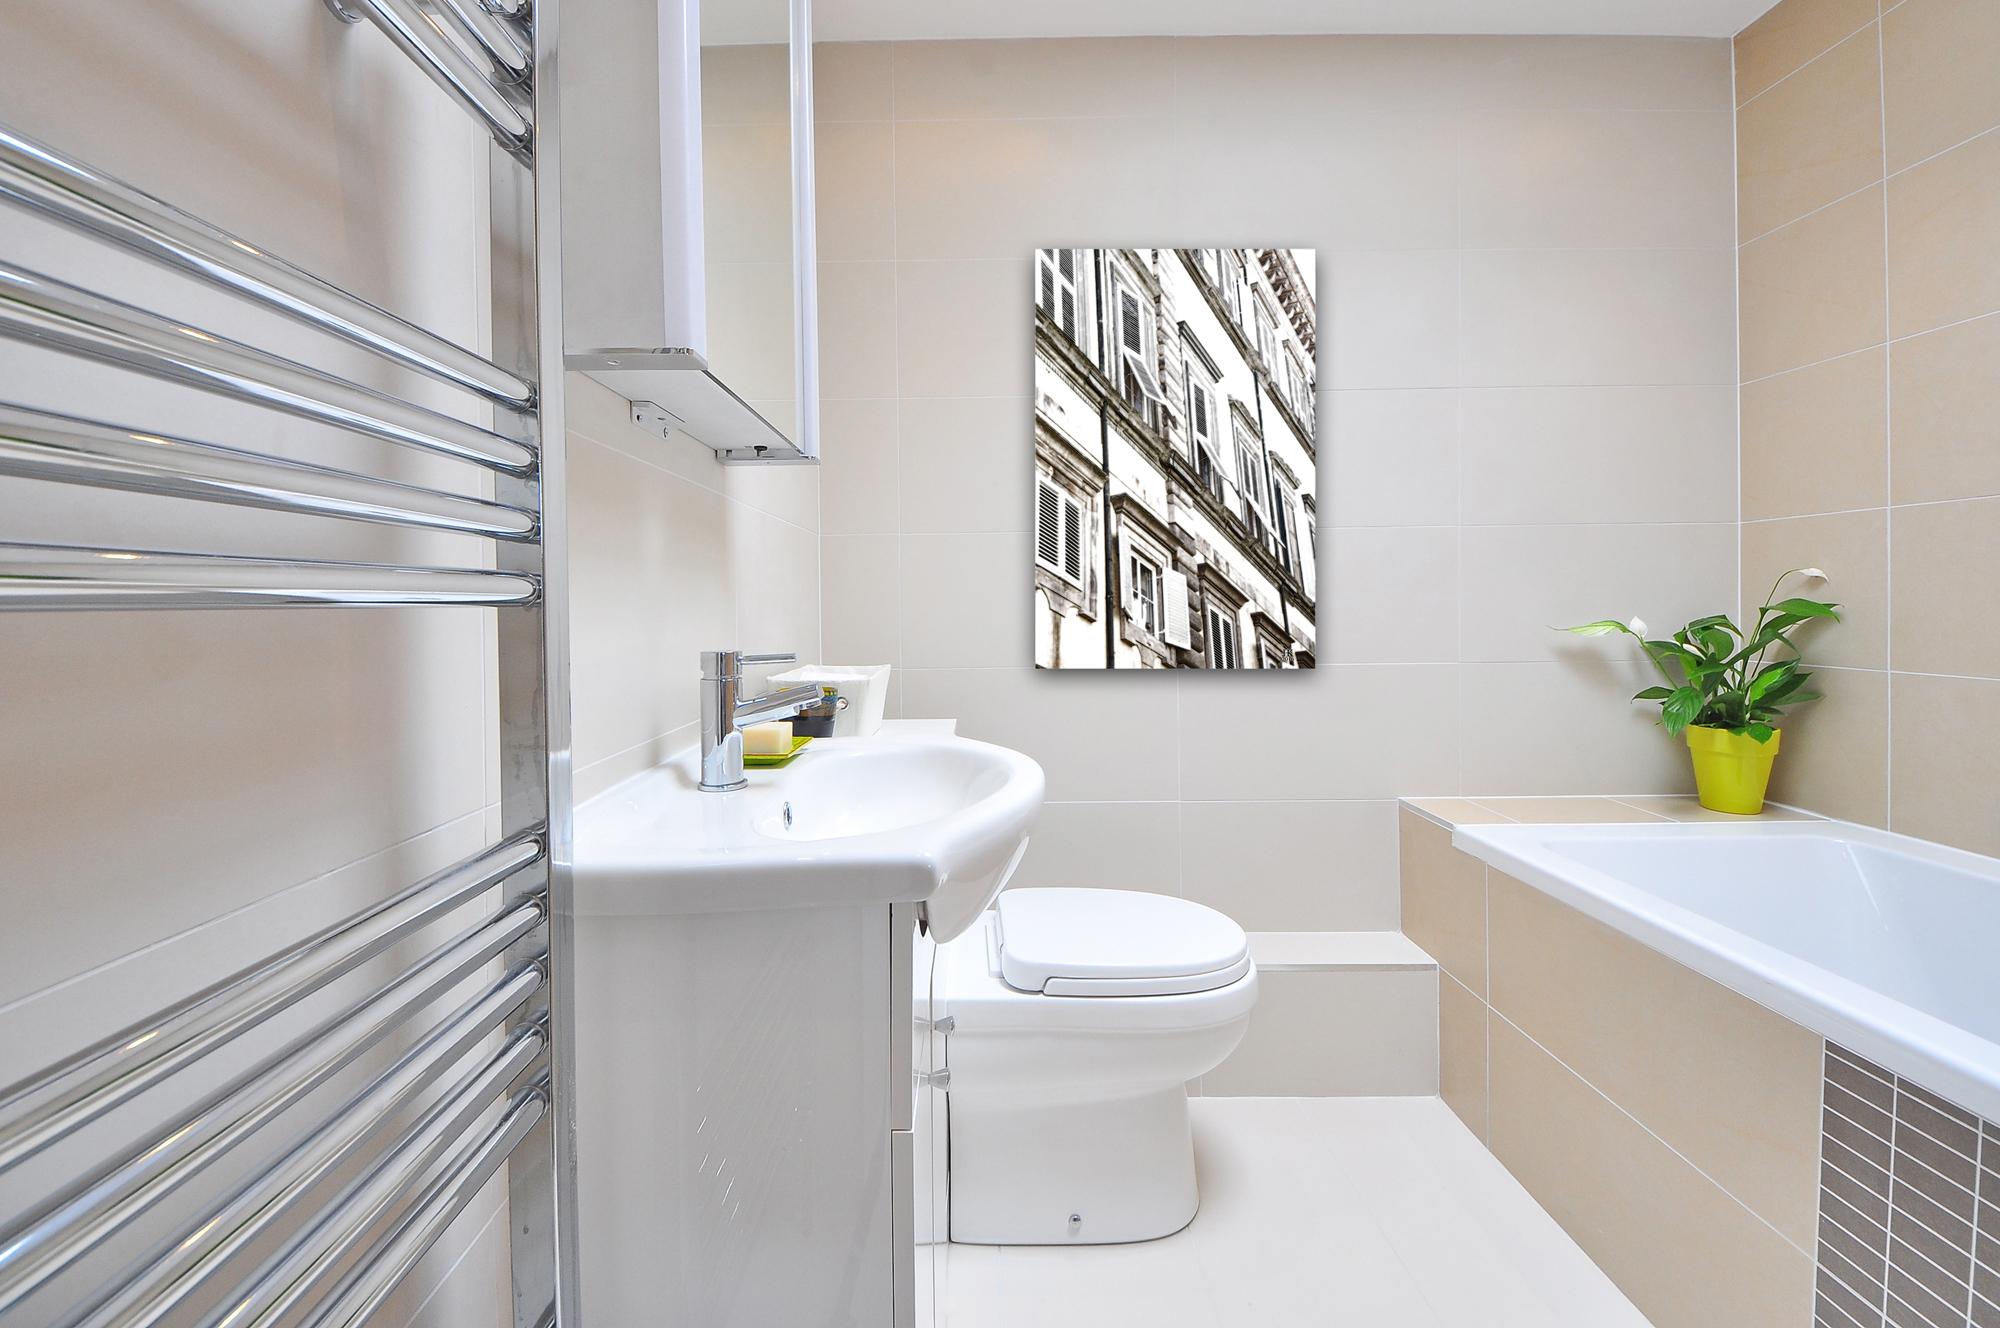 Italiaanse gevel 1 hjk art - Italiaanse badkamer ...